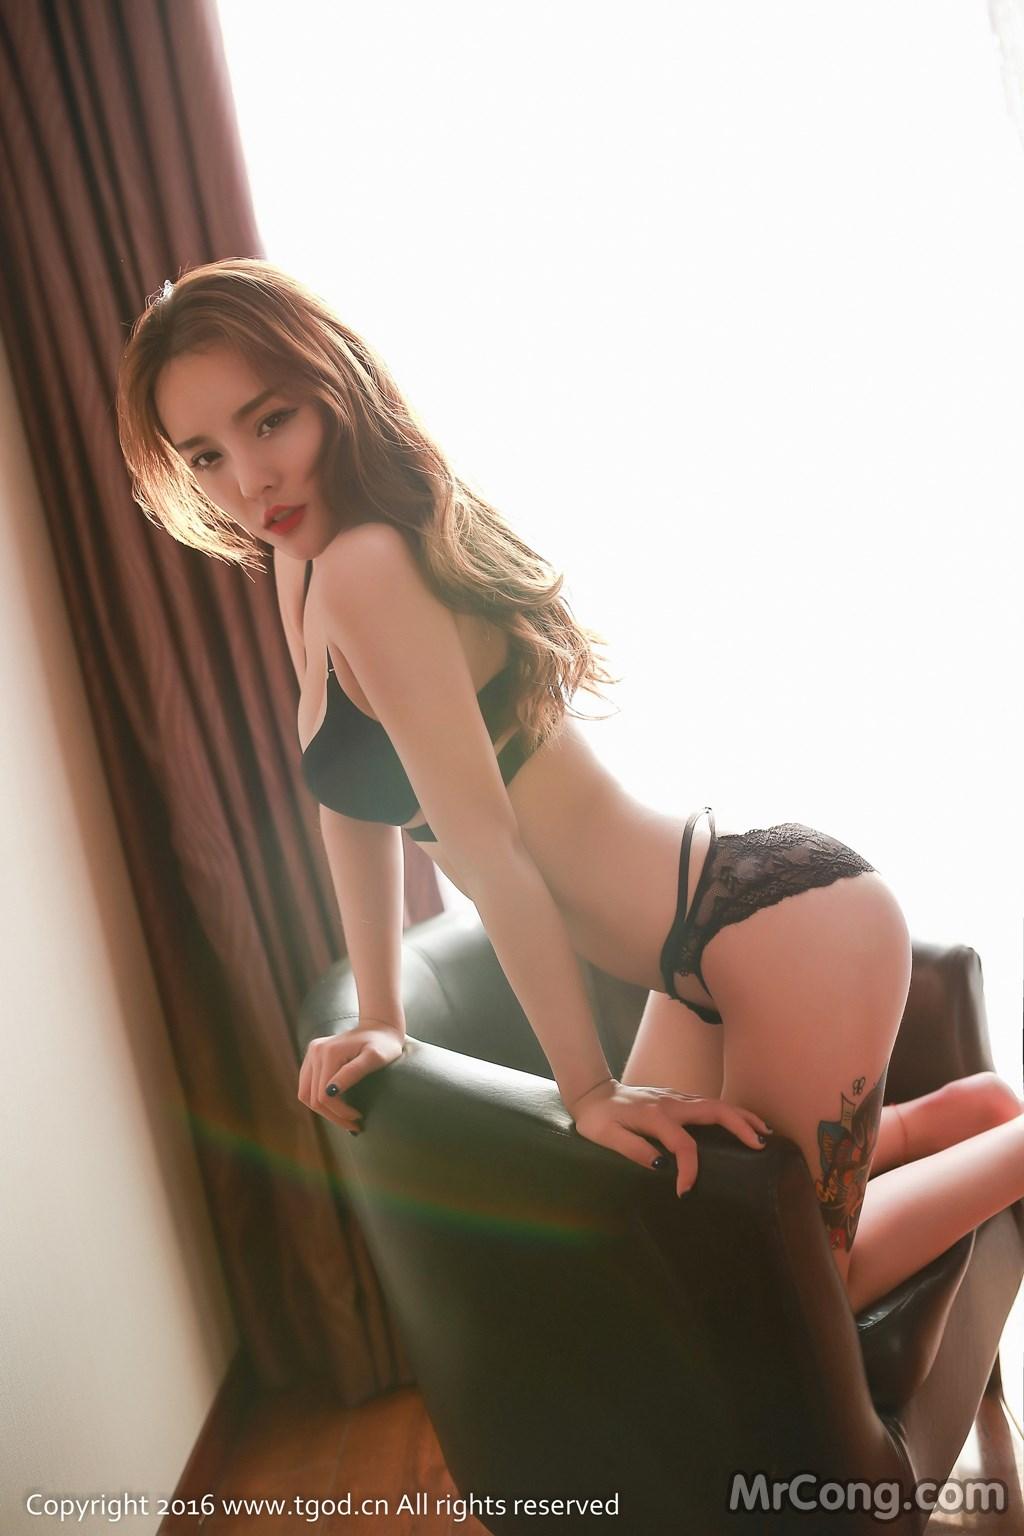 Image MrCong.com-TGOD-2016-07-22-Zhan-Ni-Hua-001 in post TGOD 2016-07-22: Người mẫu Zhan Ni Hua (珍妮花) (40 ảnh)